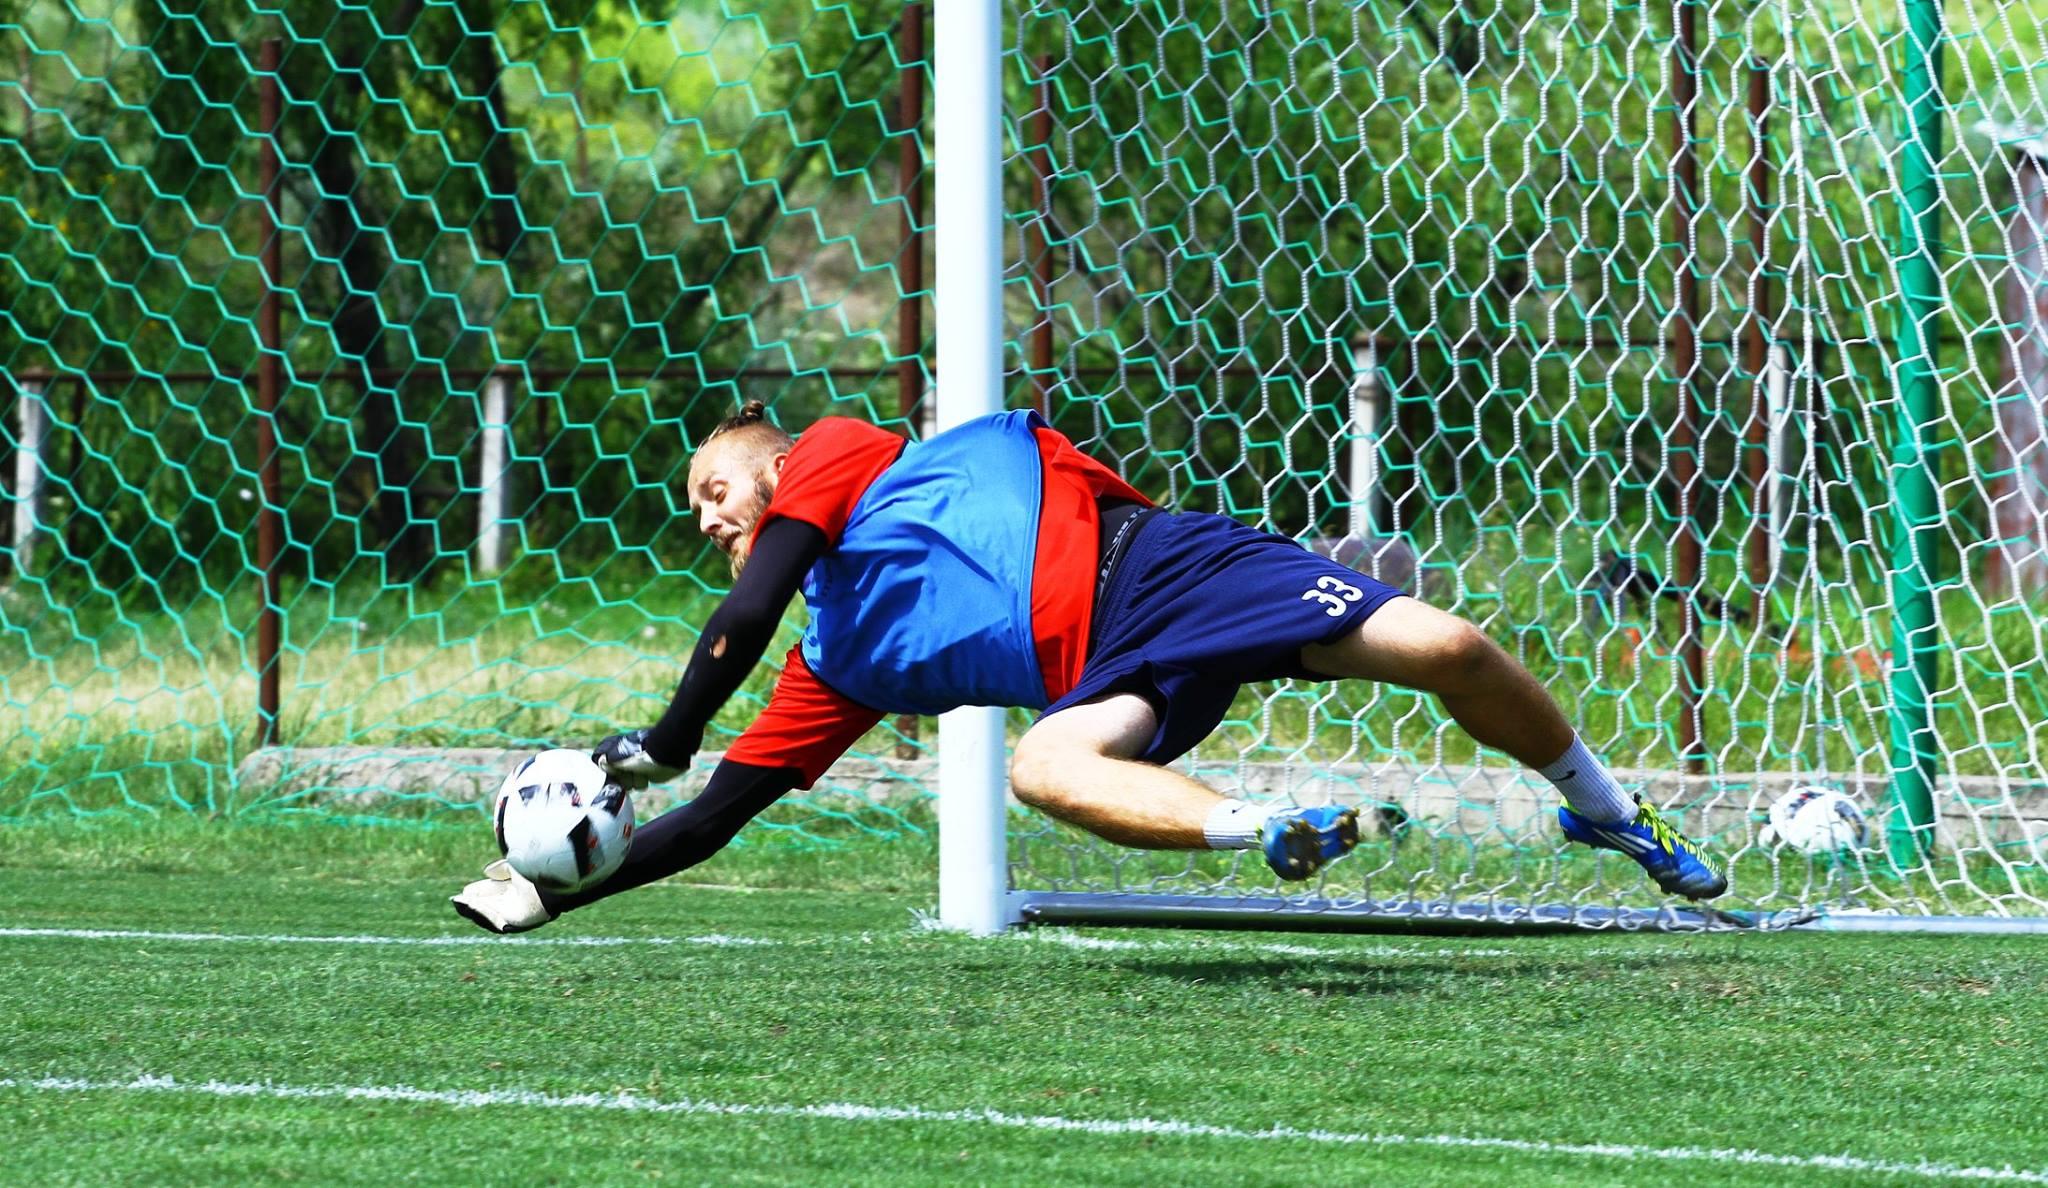 Прогноз на матч Сербия - Румыния: виктория достанется сербскому коллективу